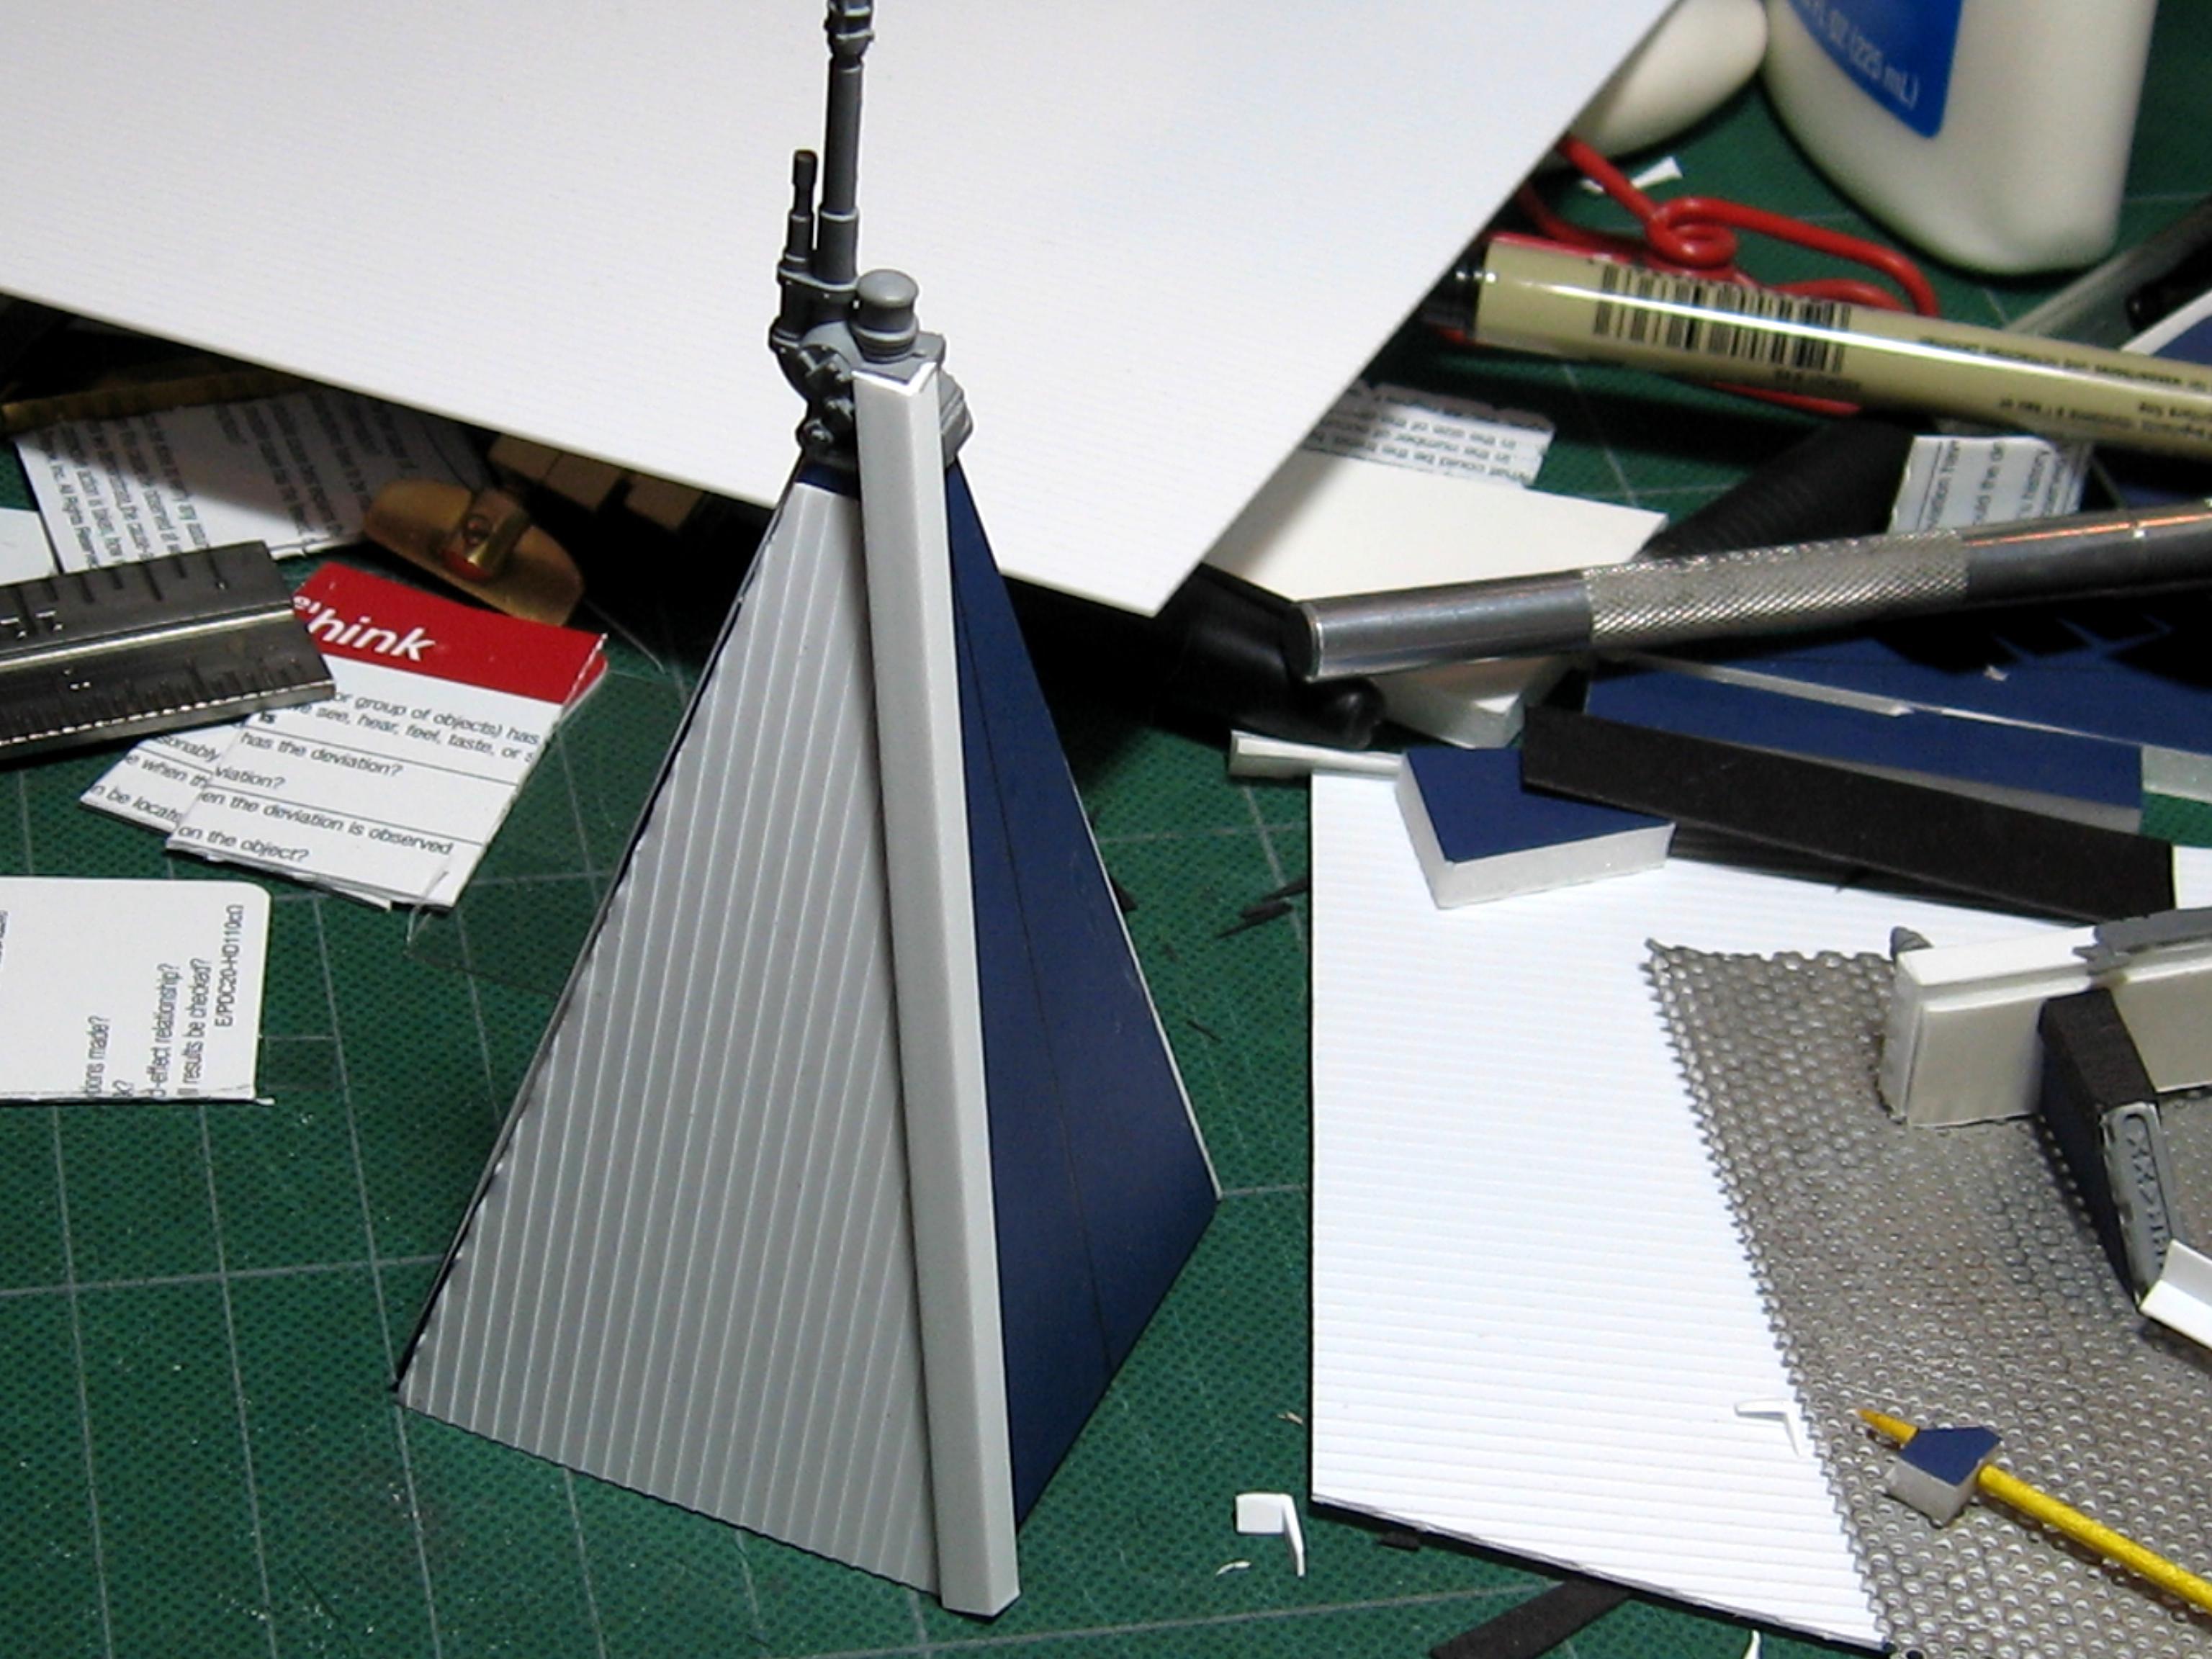 Roof sample